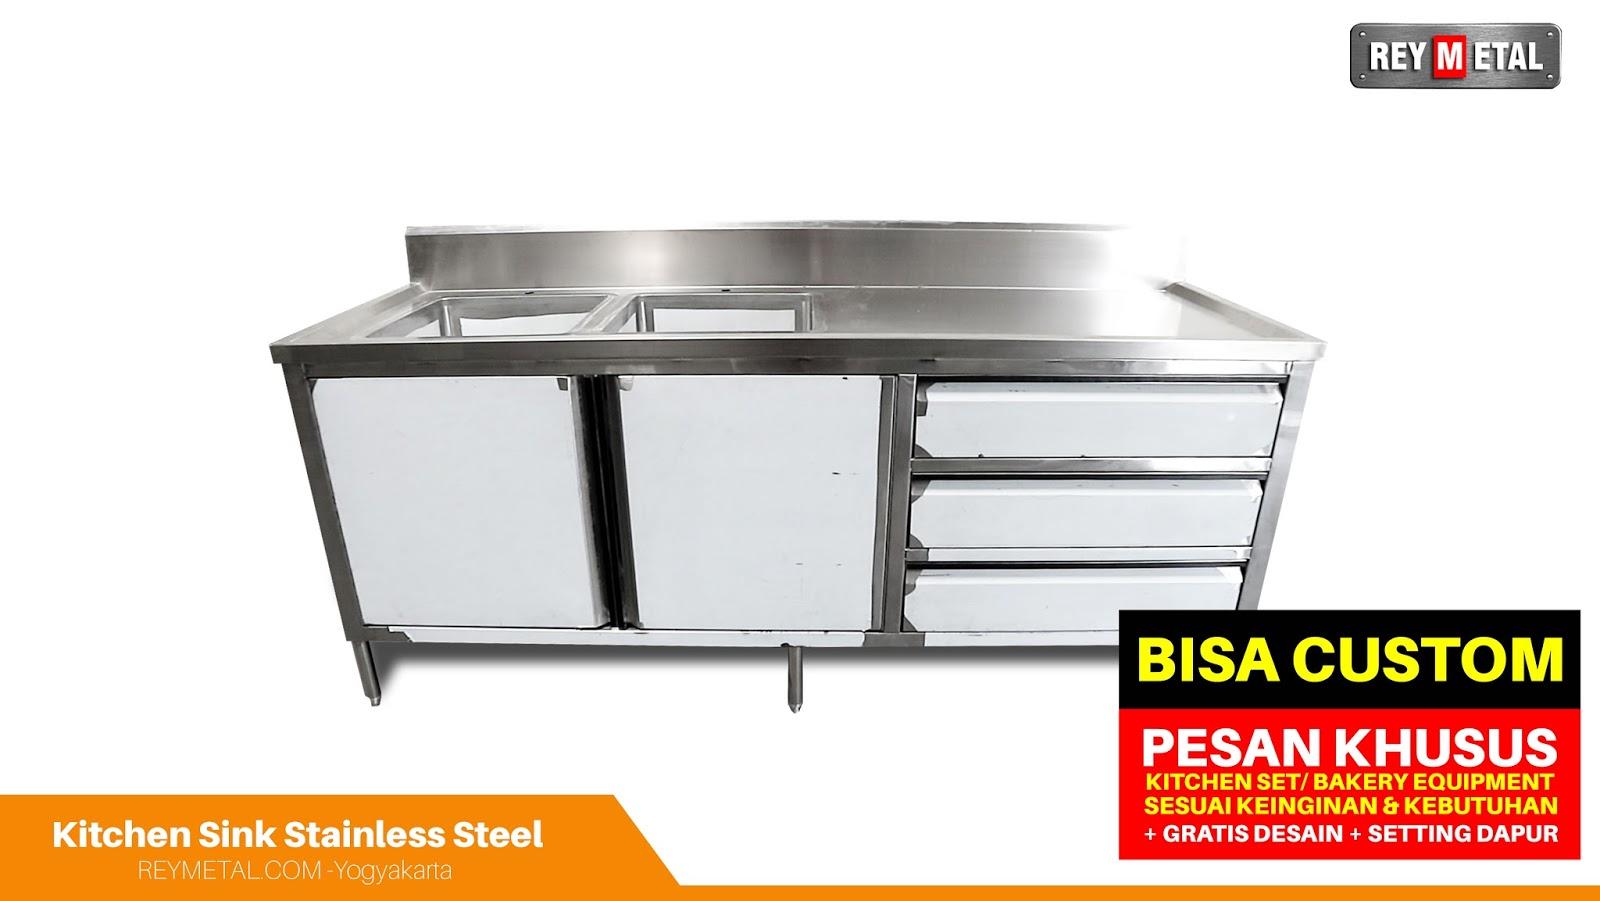 kitchen+sink+stainless+steel+harga+murah.jpg